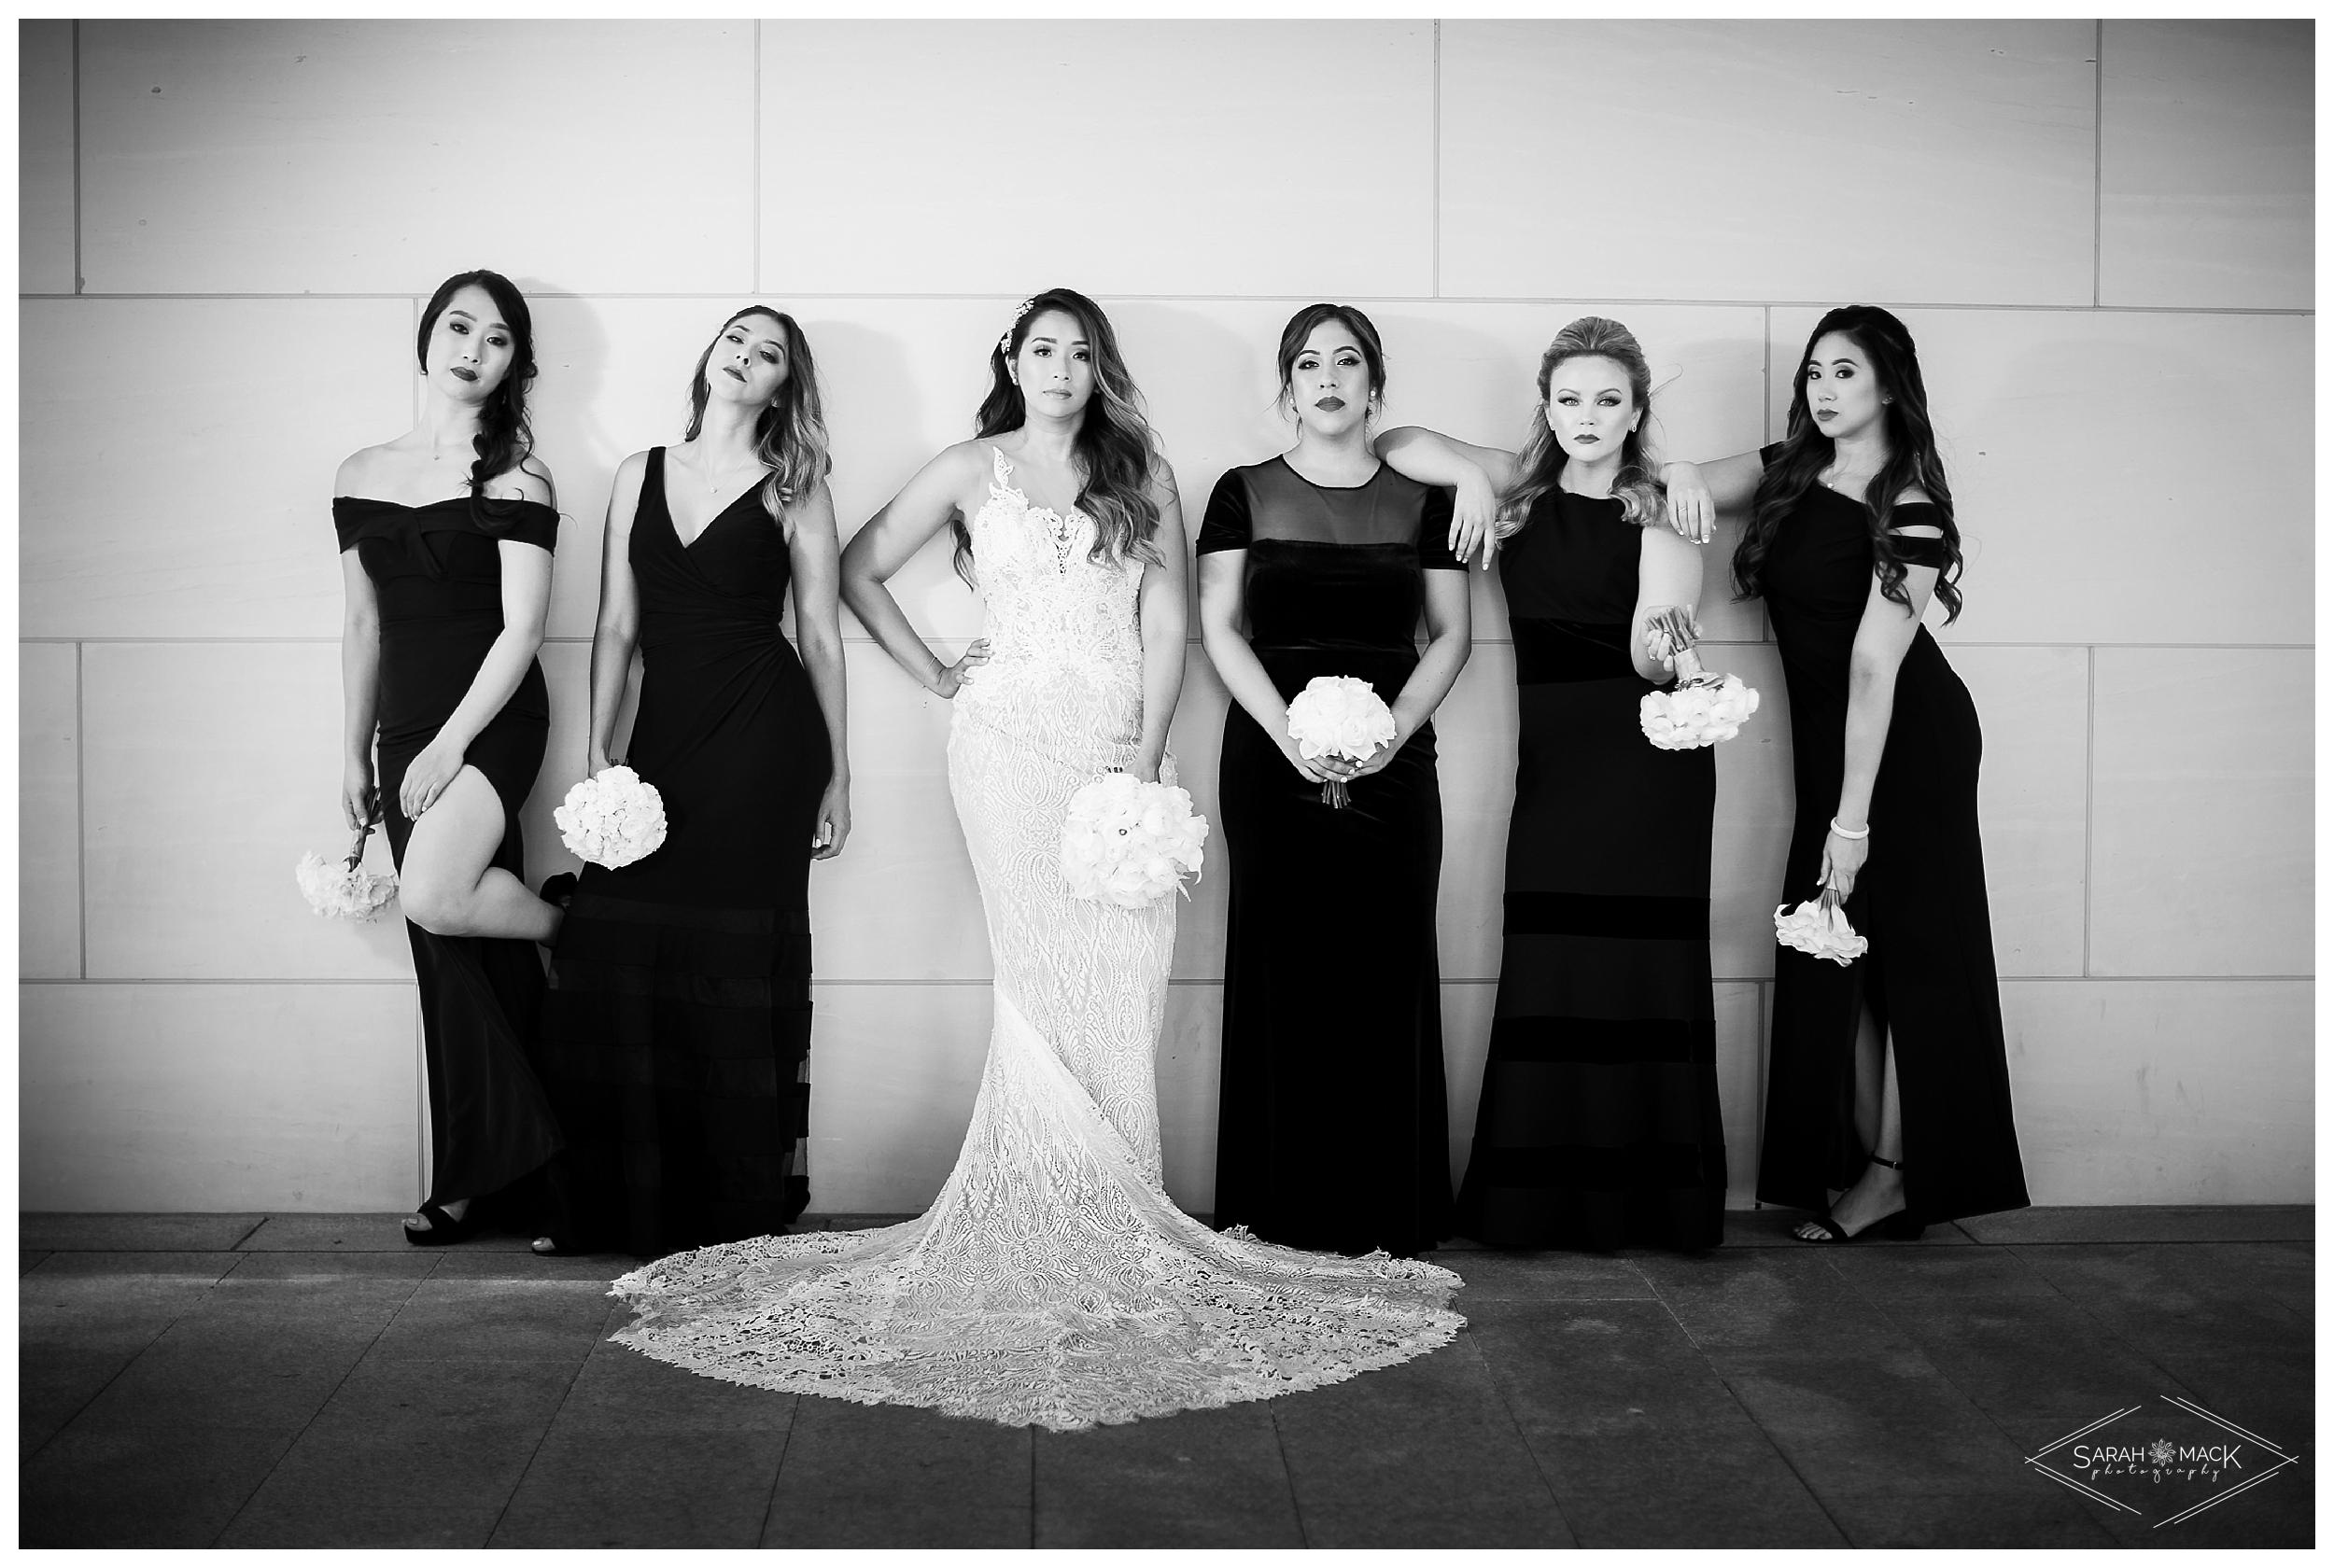 LE-Avenue-of-the-Arts-Costa-Mesa-Wedding-Photography-0110.jpg